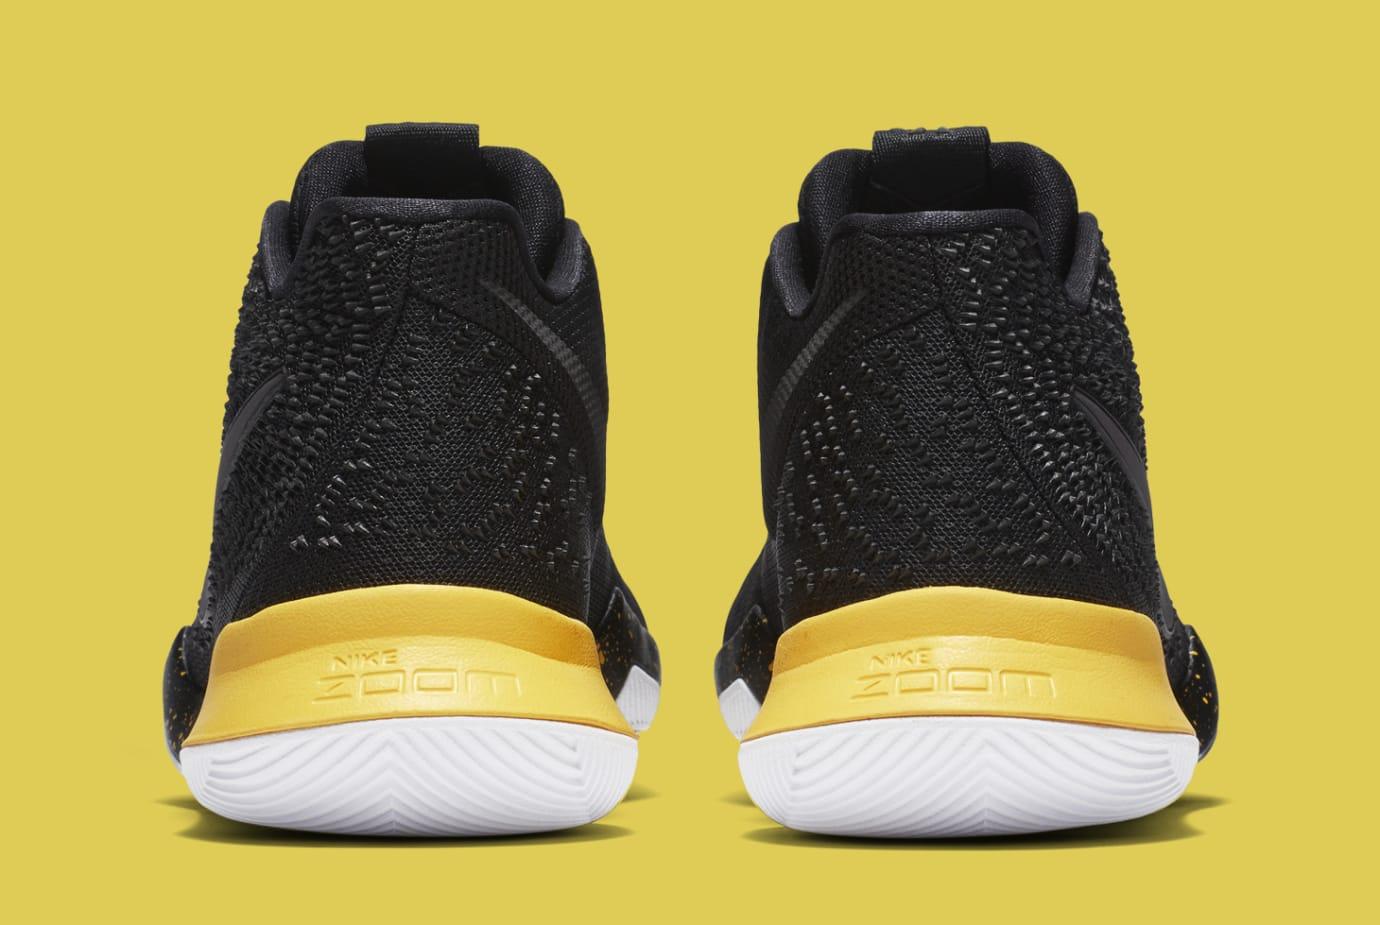 Nike Kyrie 3 Black Yellow Multicolor 852396-901 Heel